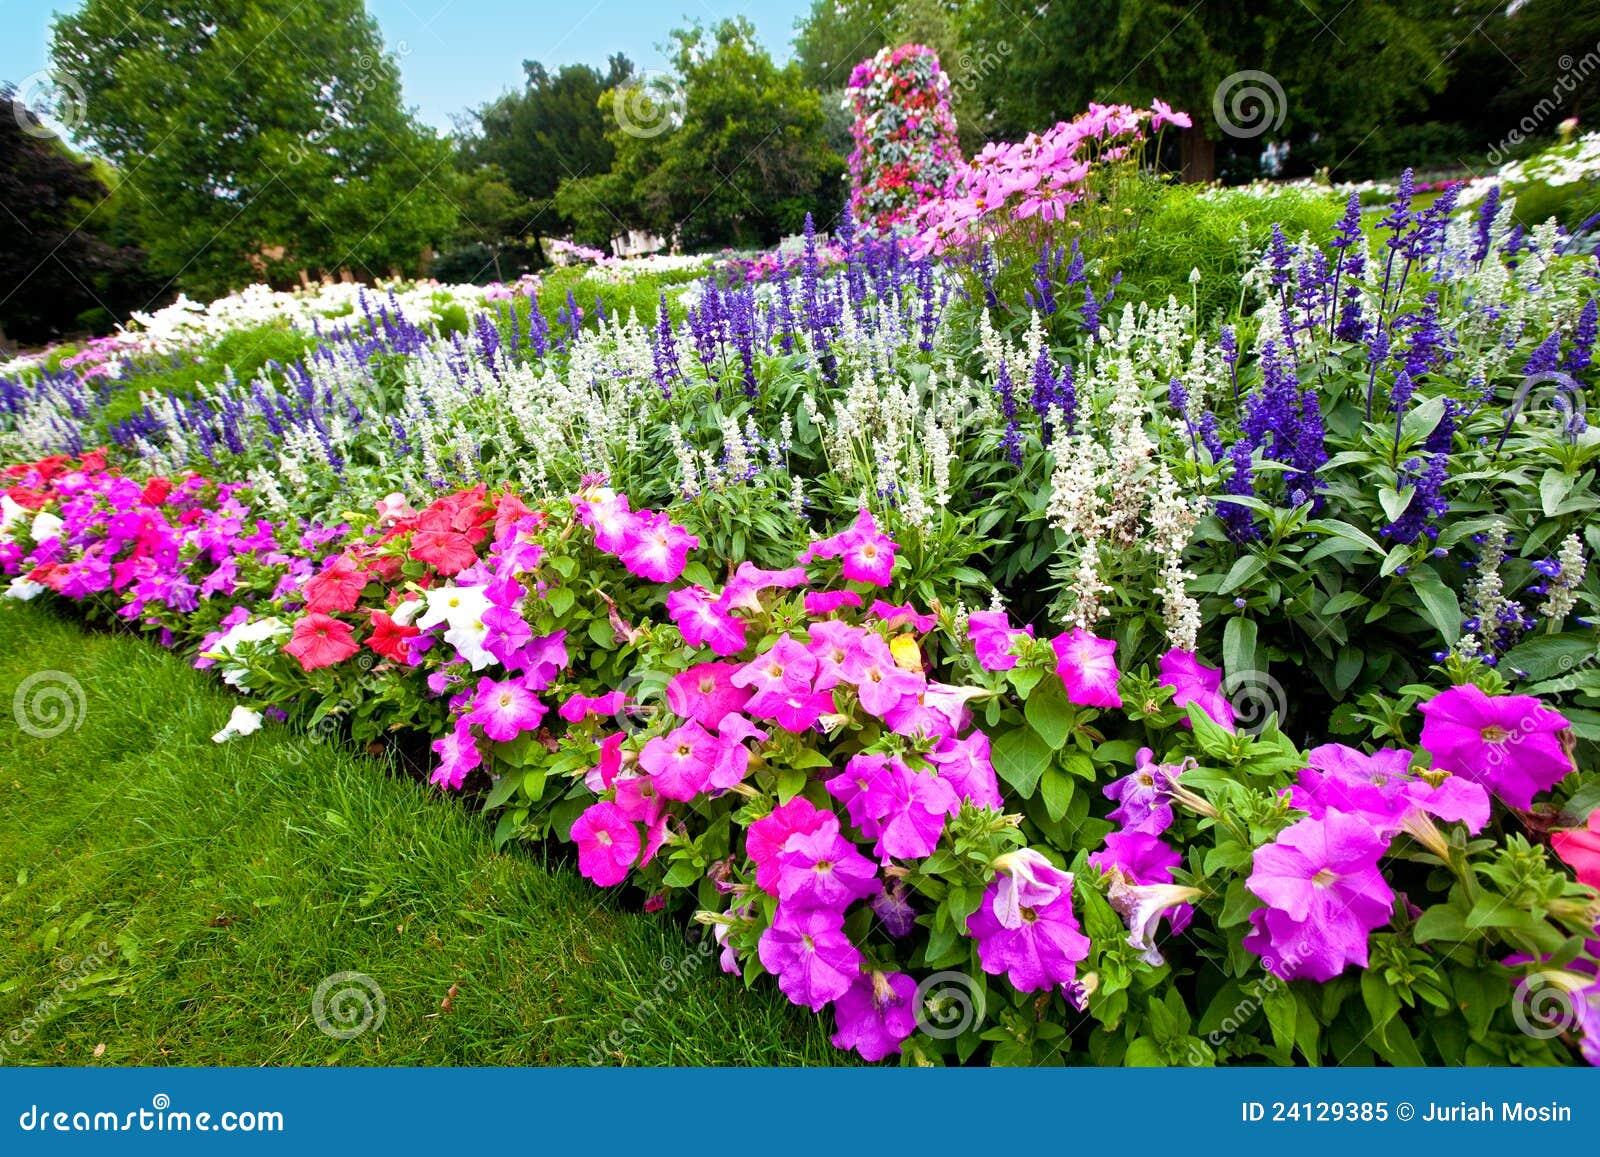 Manicured Flower Garden With Colorful Azaleas Royalty Free Stock Photo Ima